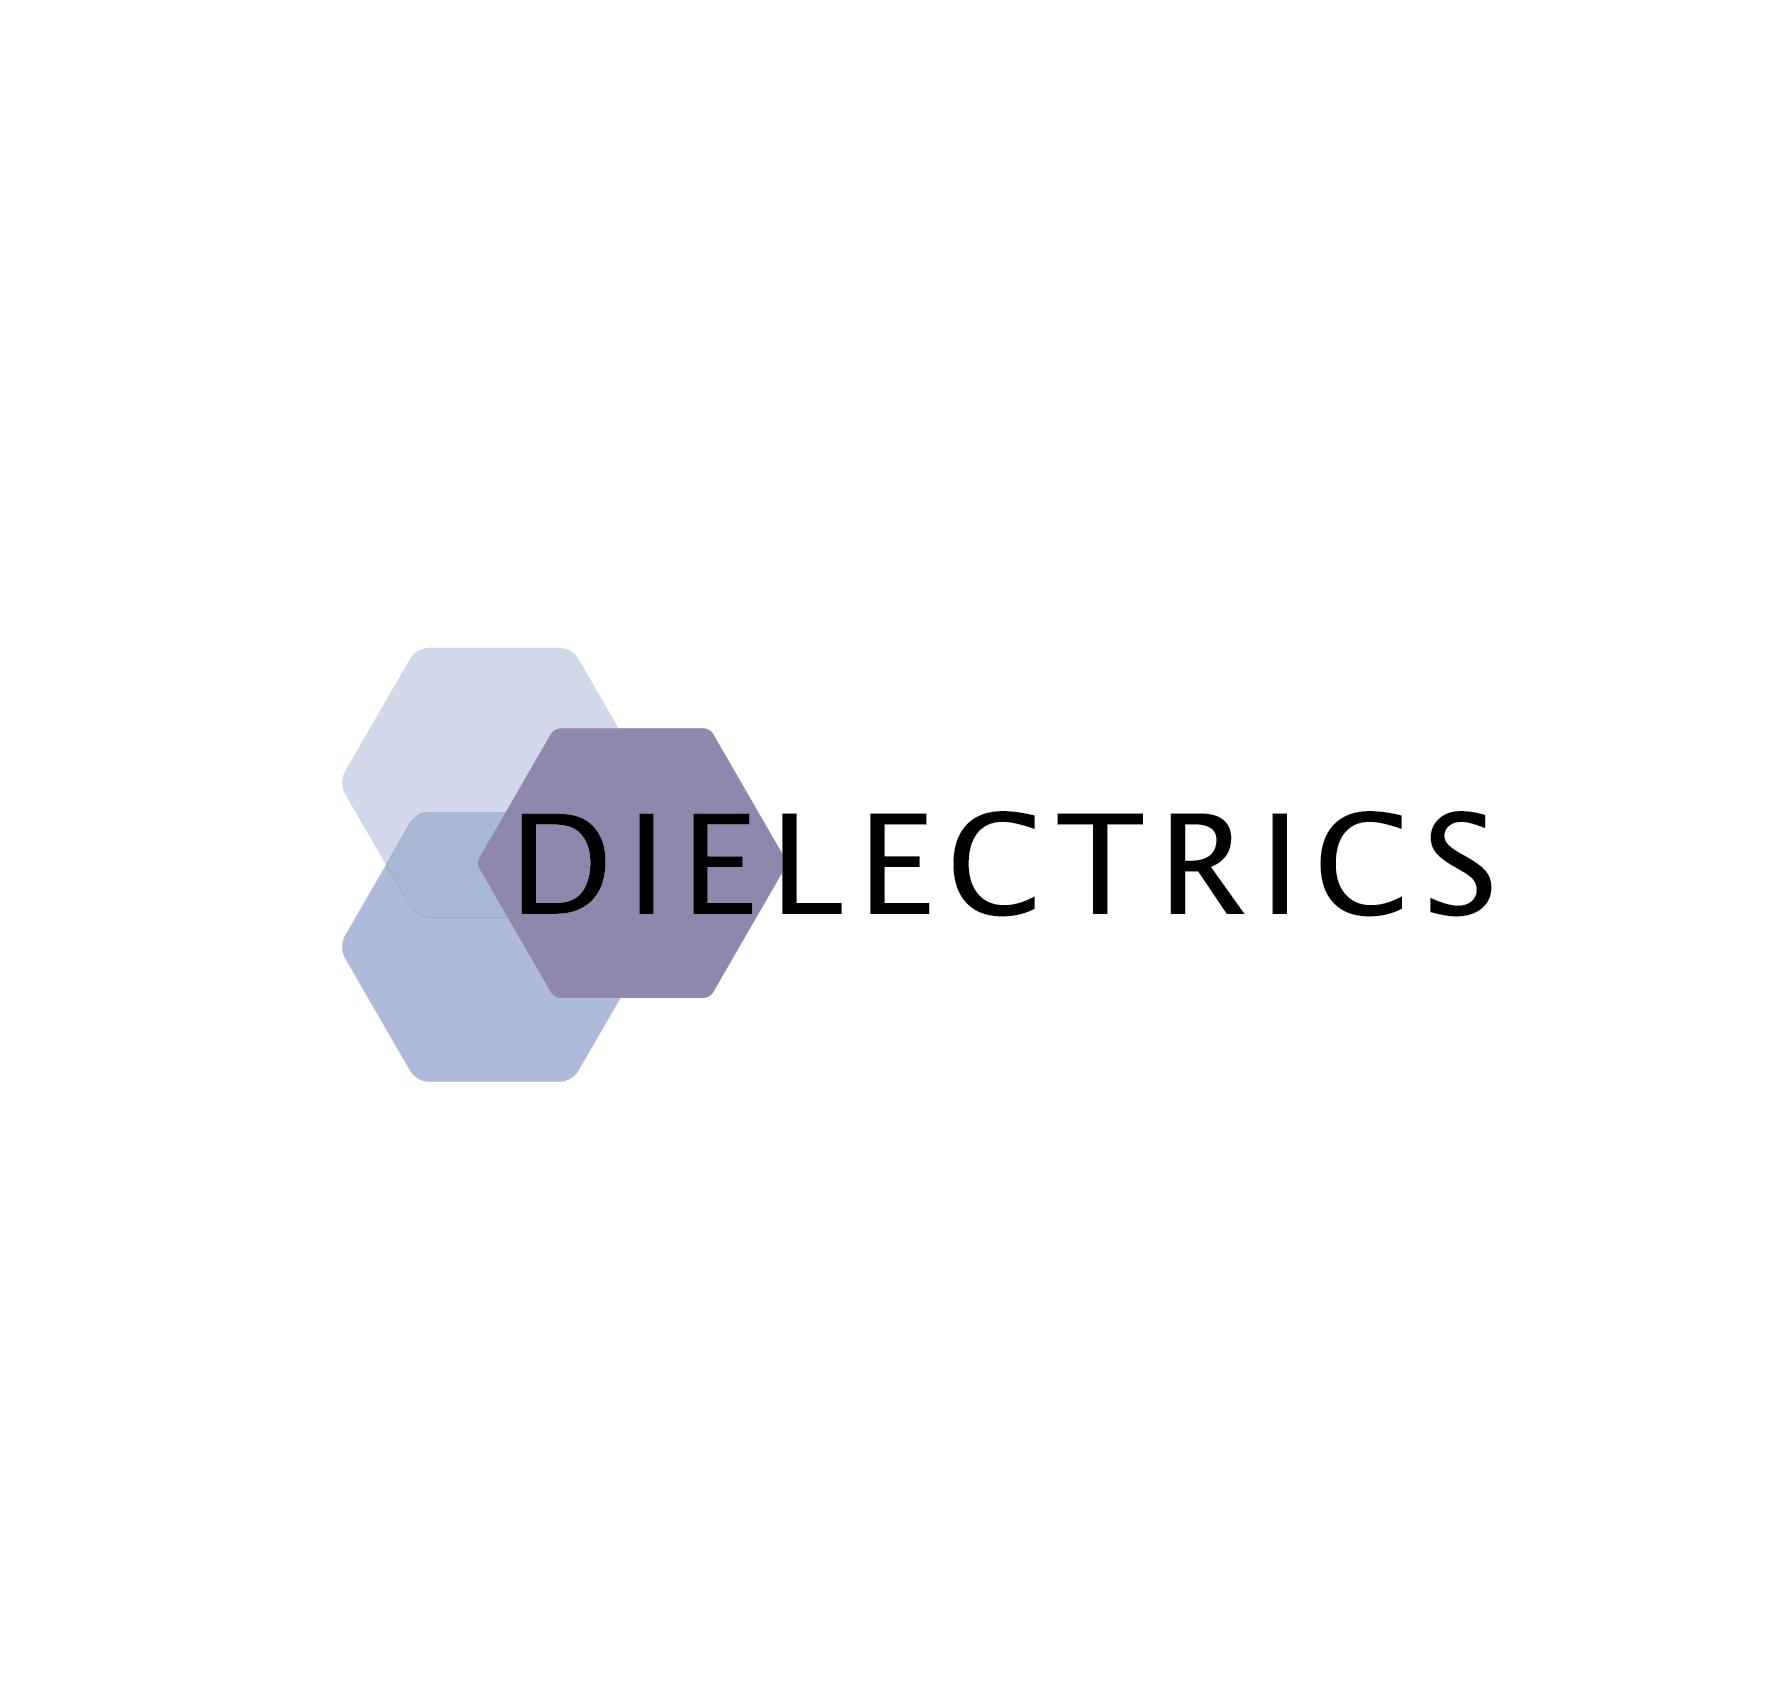 Dielectrics Logo